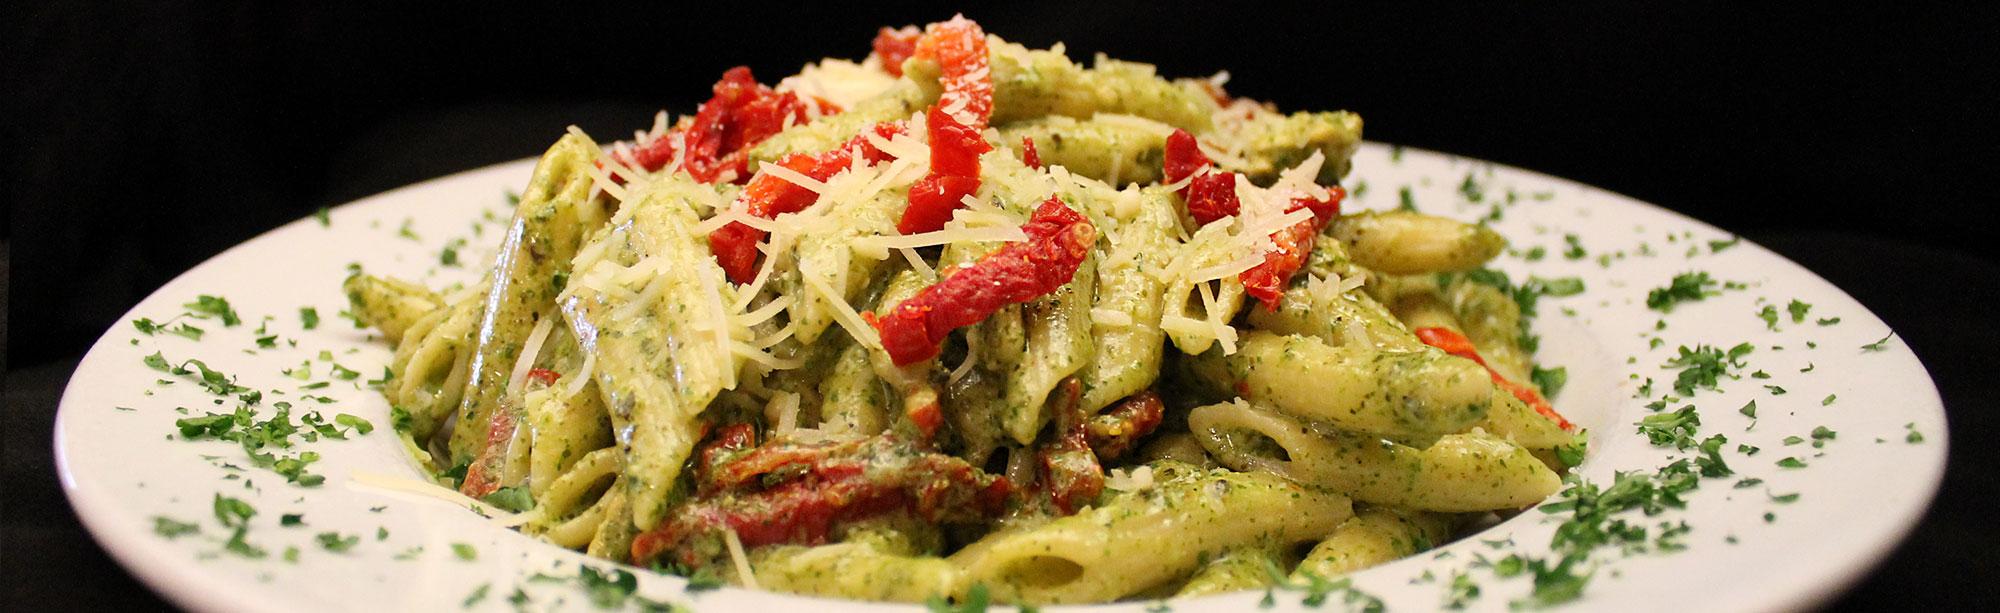 Daily-Specials-pasta-photo